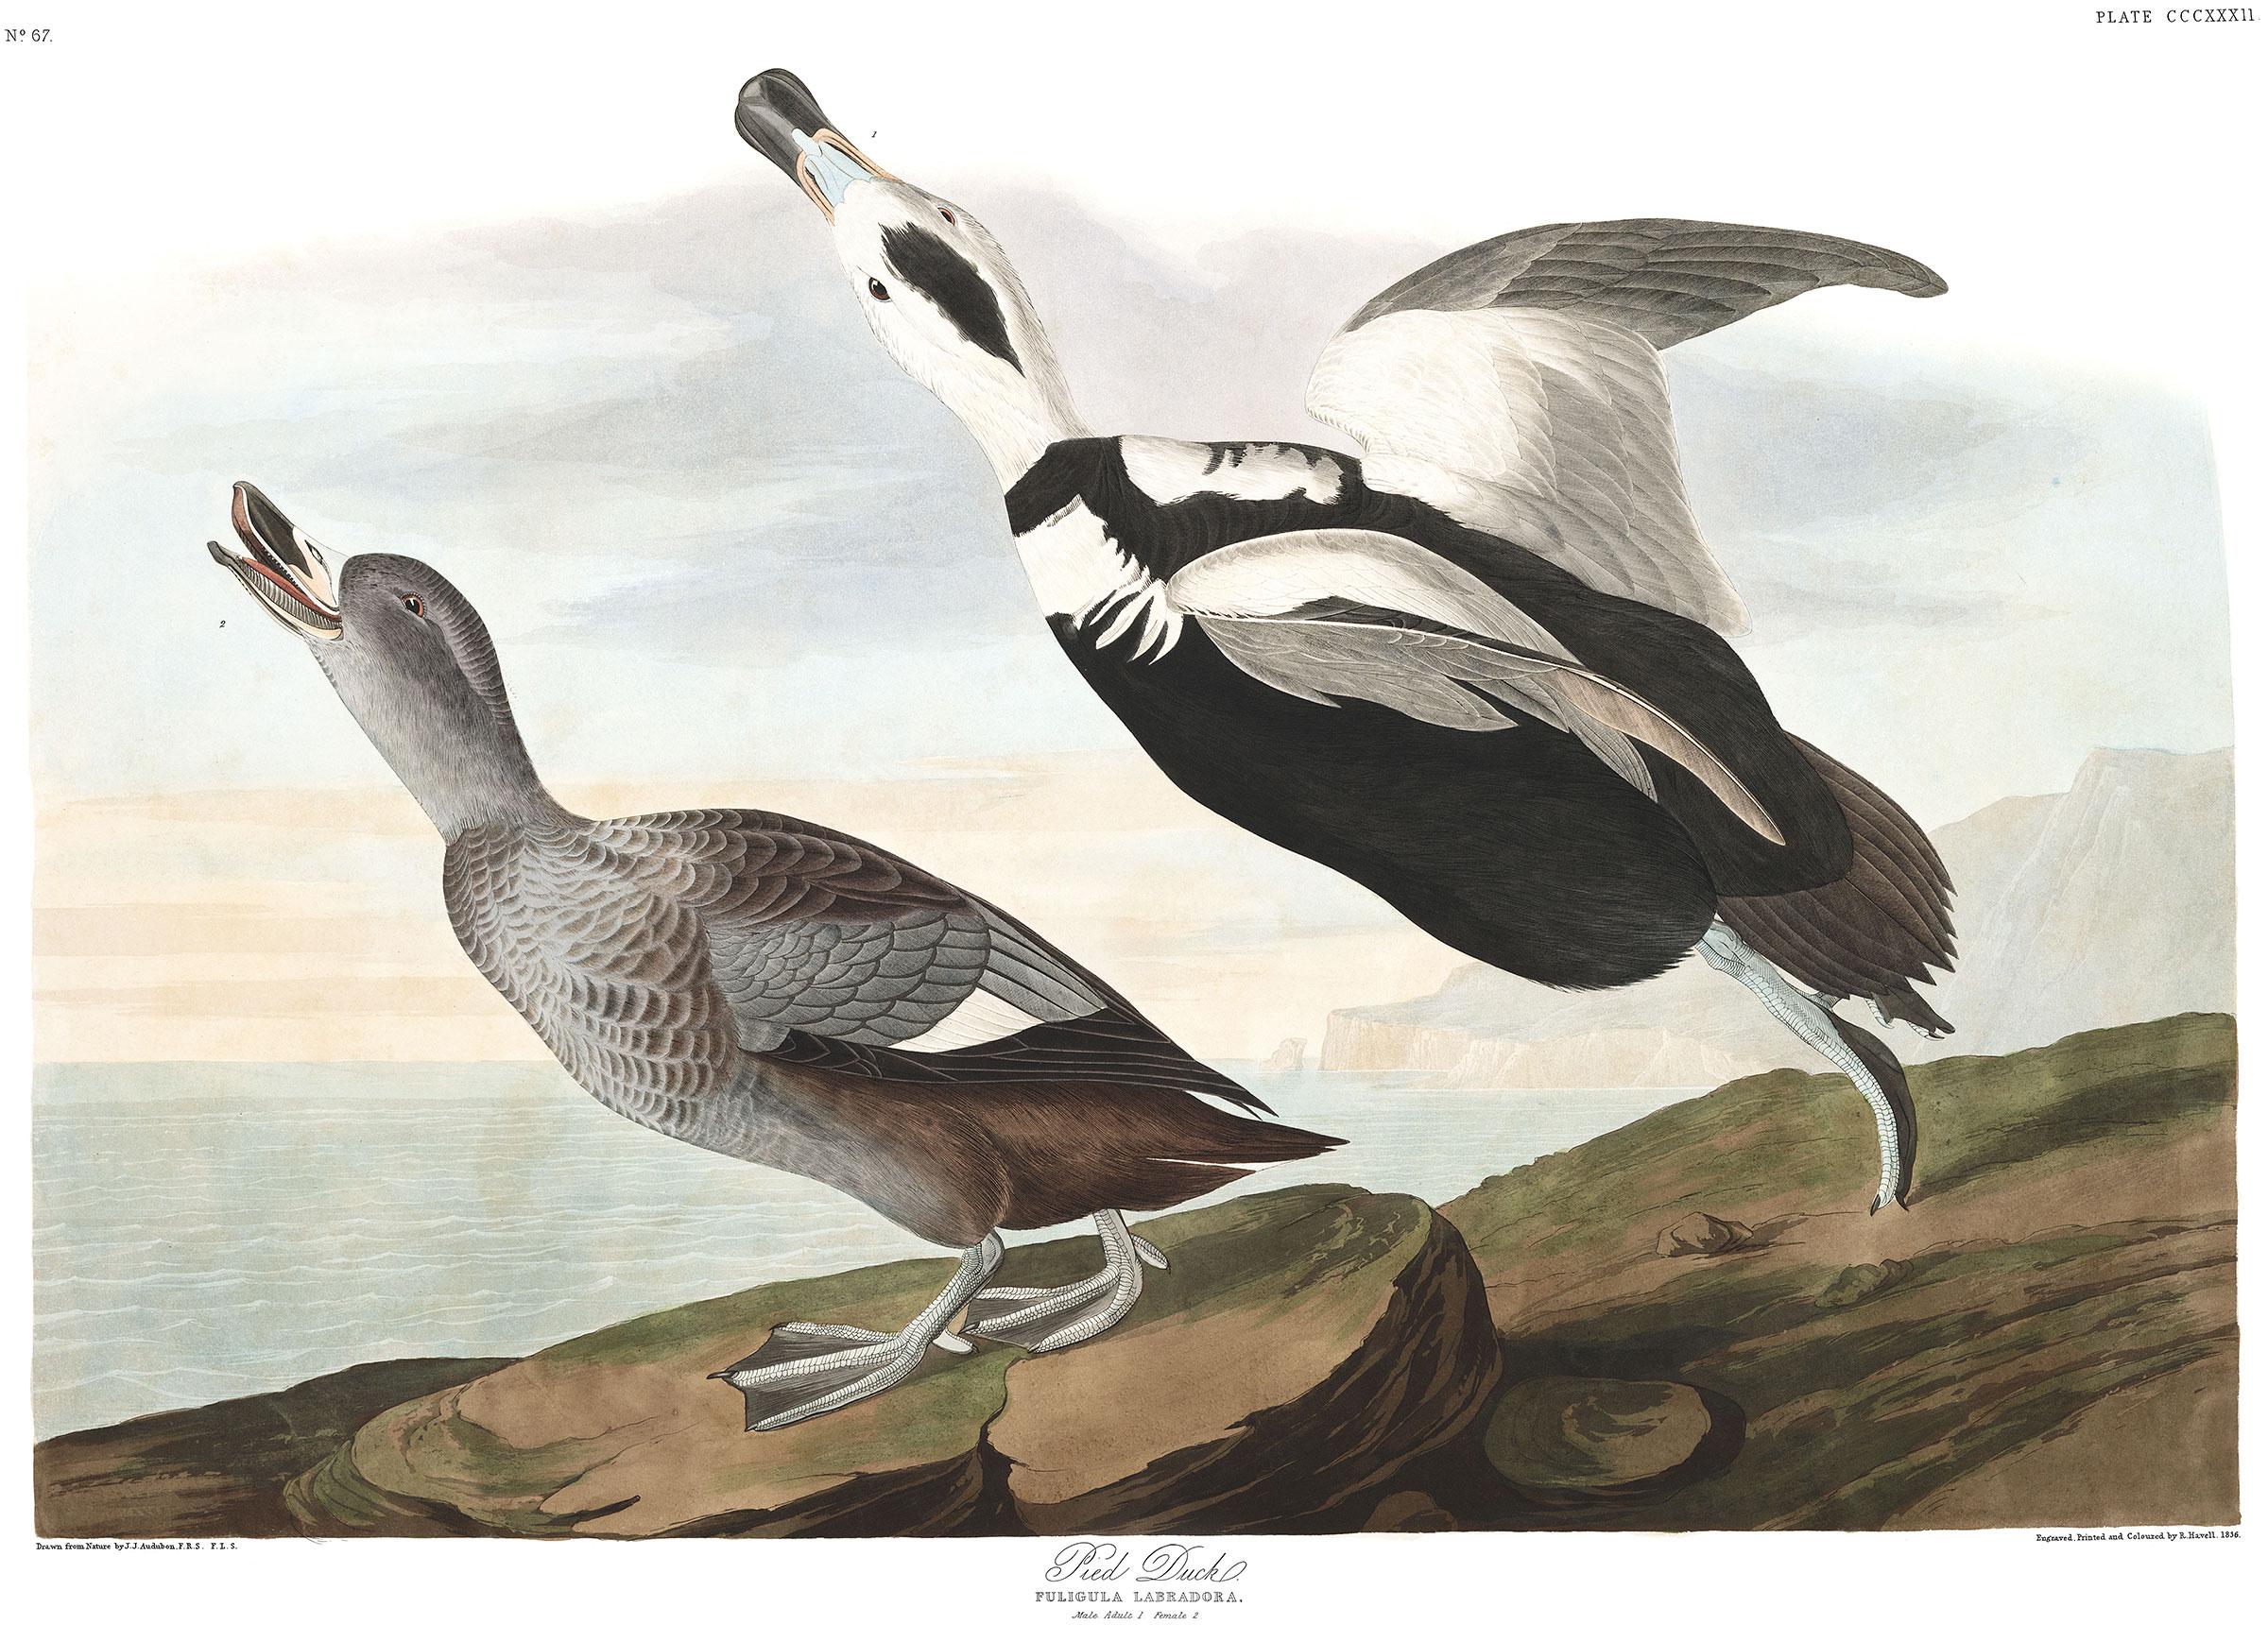 Labrador Duck. Illustration: Courtesy of the John James Audubon Center at Mill Grove, Montgomery County Audubon Collection, and Zebra Publishing